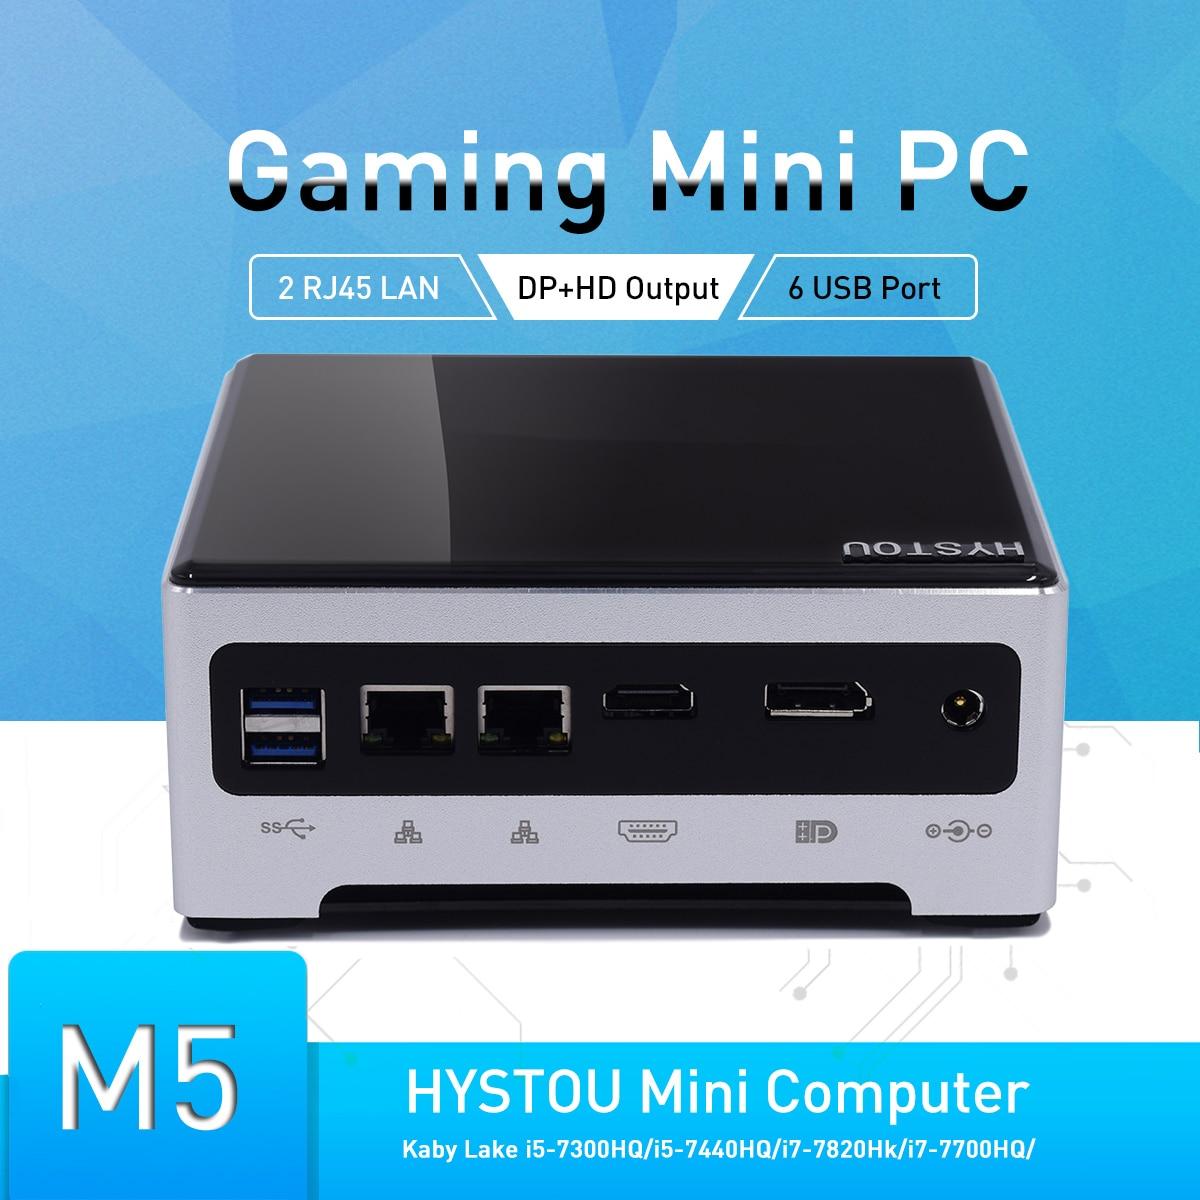 Hystou nuevo Mini PC Core i7 7820HK i5 7440HQ Dual M.2 NVME SSD Windows 10 Pro HDMI DP cliente 64GB de RAM pequeña computadora de escritorio pc